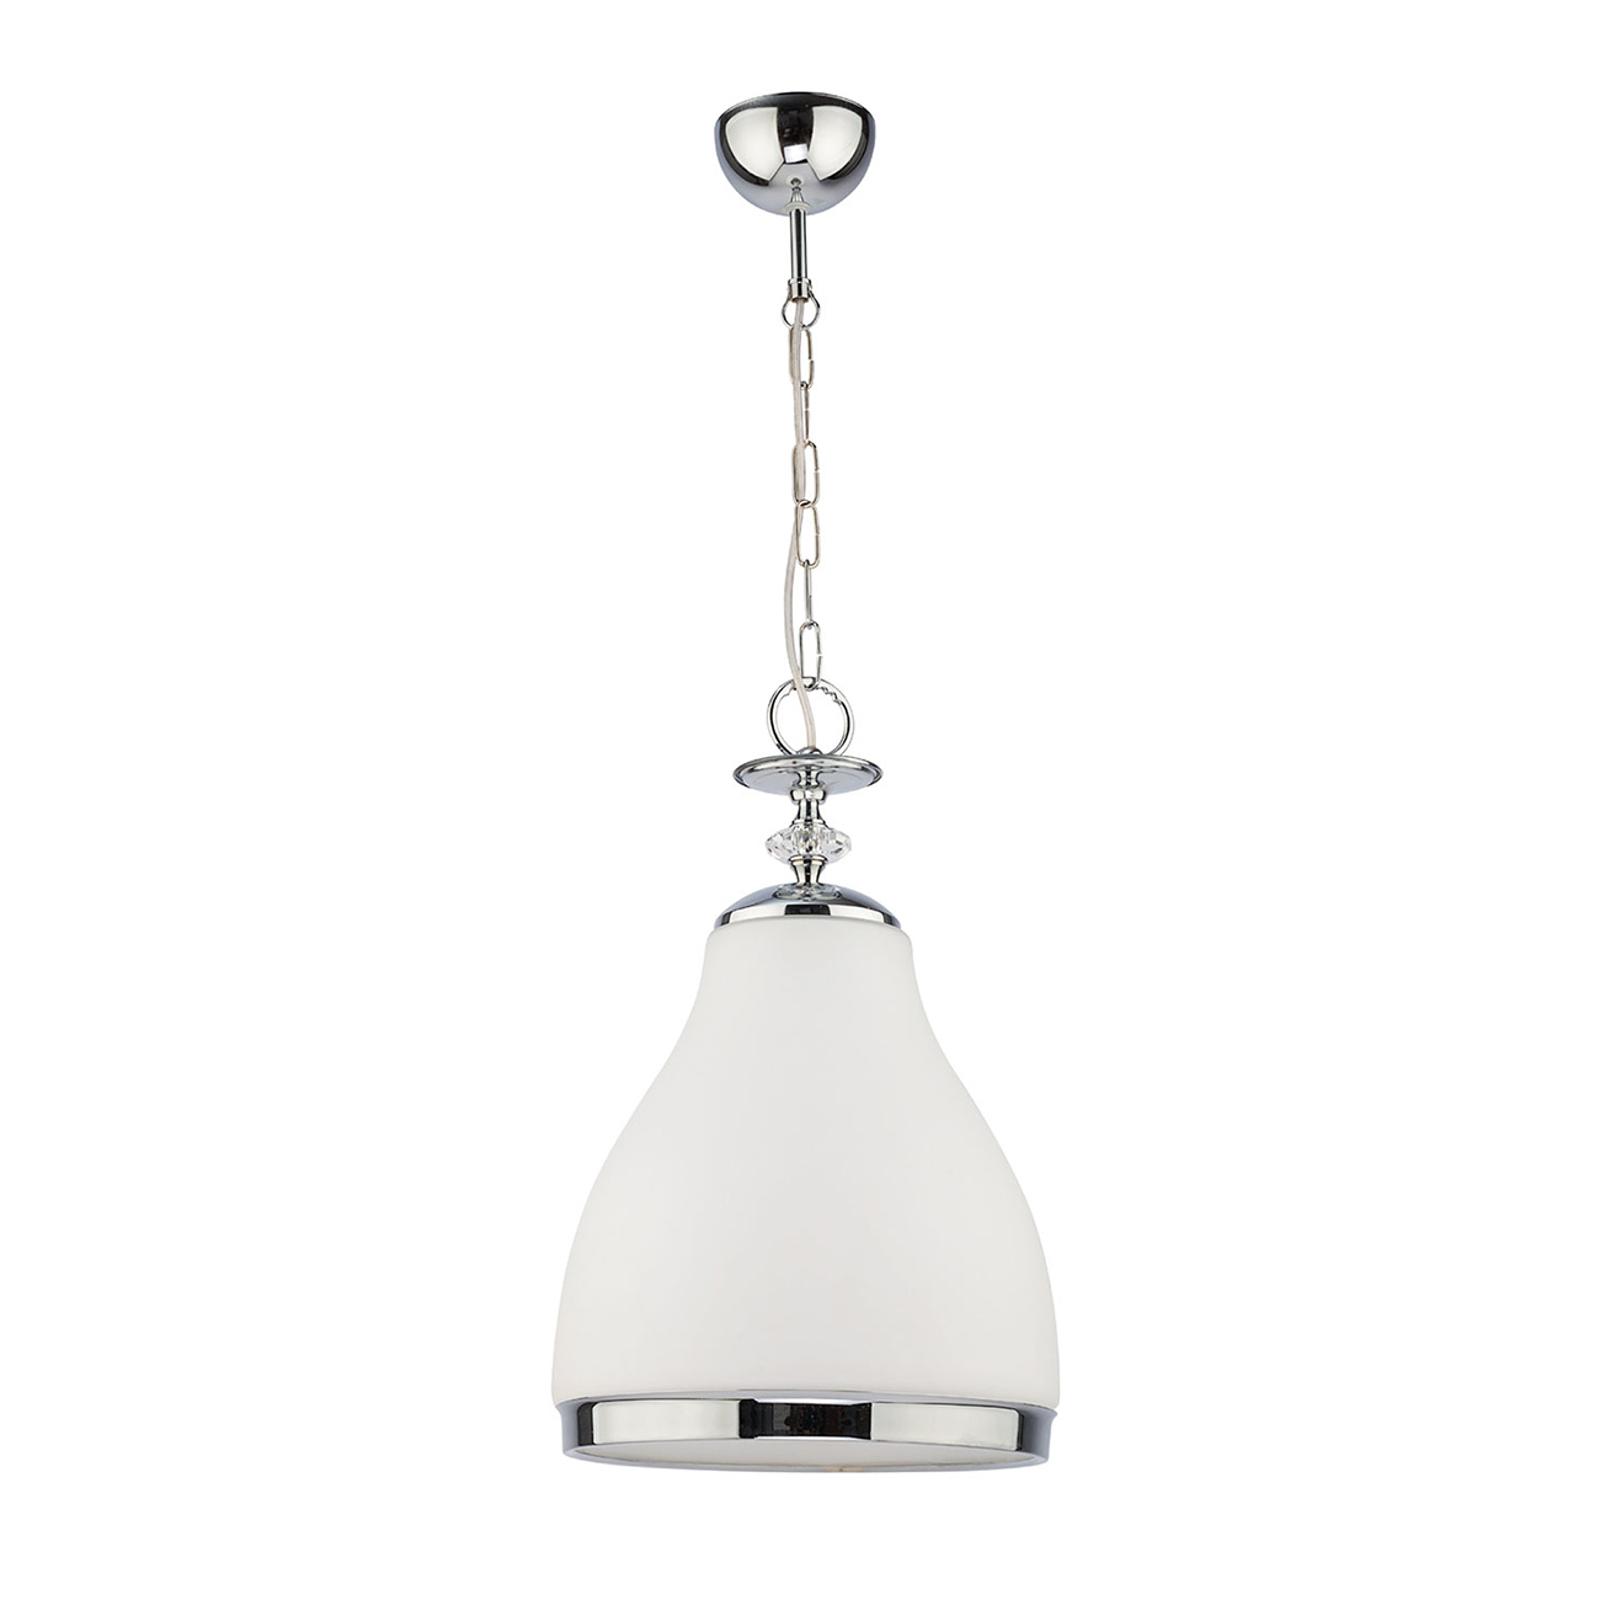 Lámpara colgante Hour, cromada, con vidrio opalino